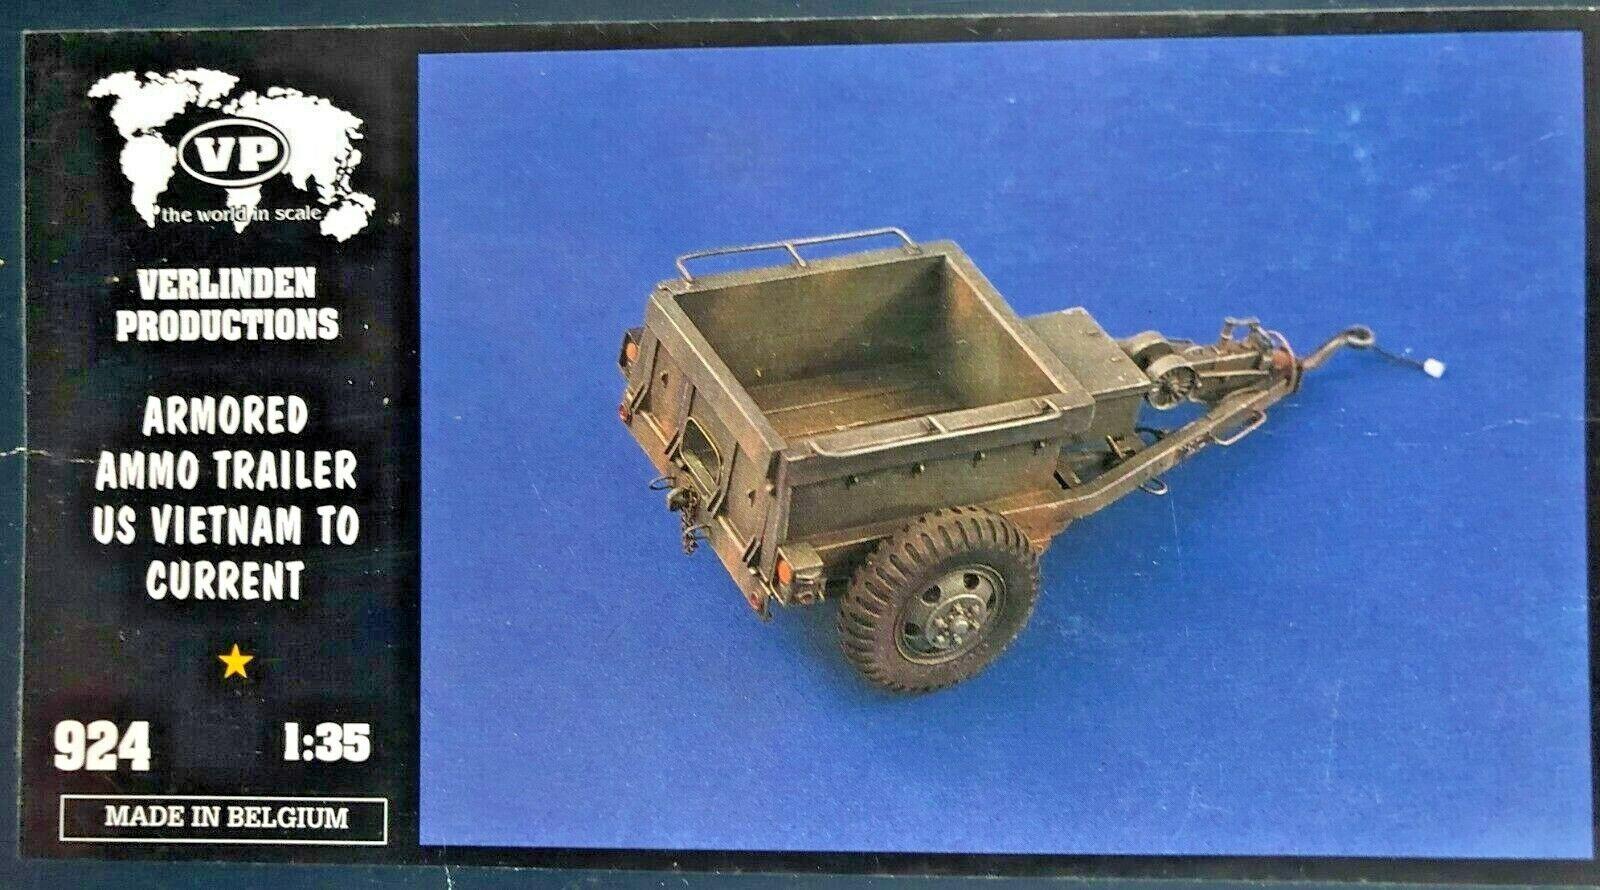 1 35 924 verlinden armored ammo trailer us vietnam to current. new